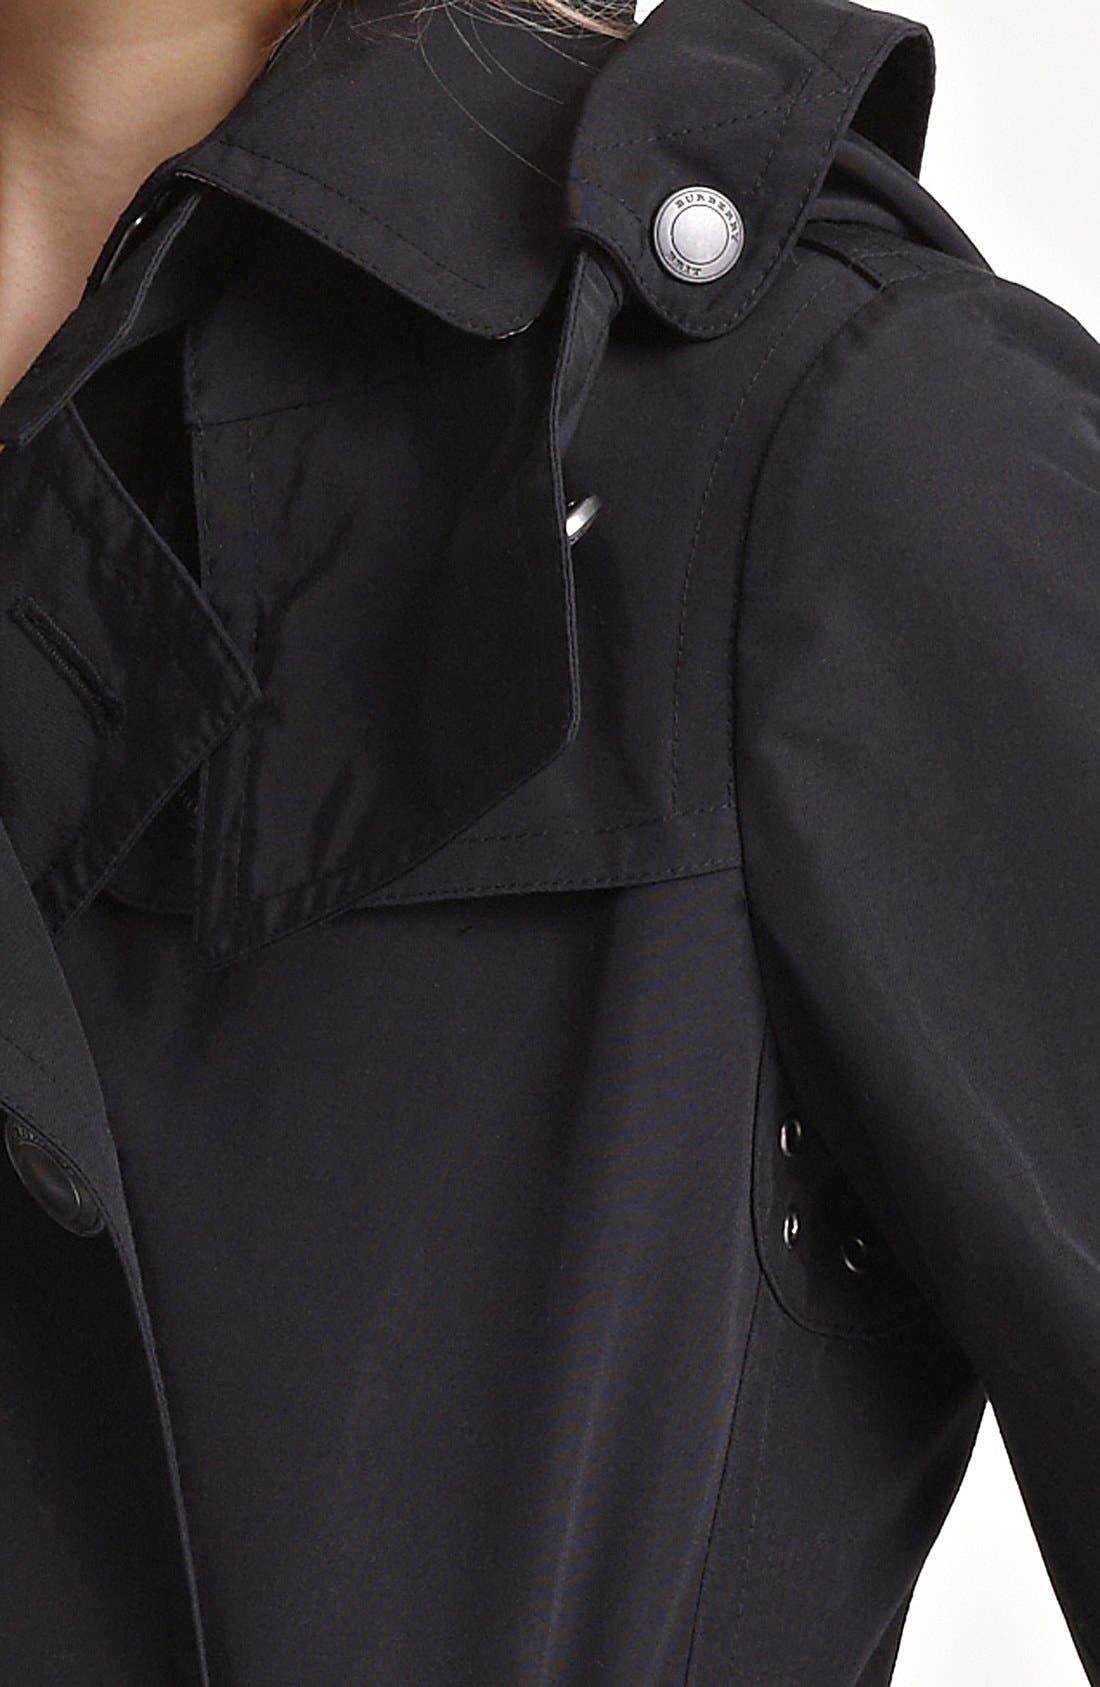 'Balmoral' Trench Coat,                             Alternate thumbnail 2, color,                             001